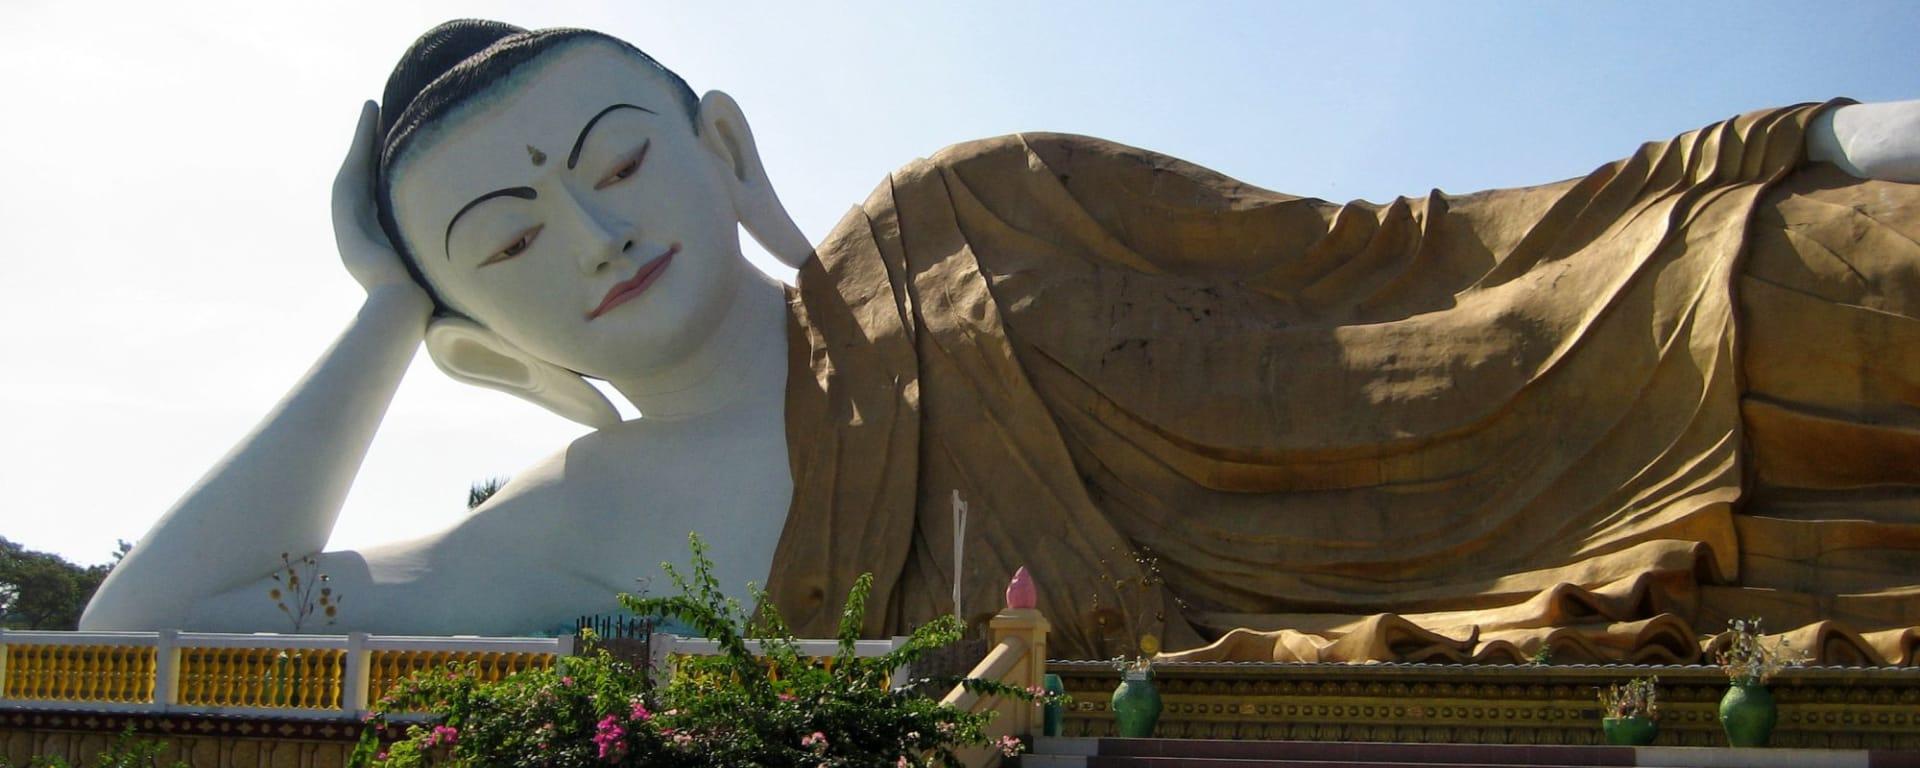 La pagode de Kyaiktiyo & le rocher d'or de Yangon: Myanmar Bago Giant Buddha